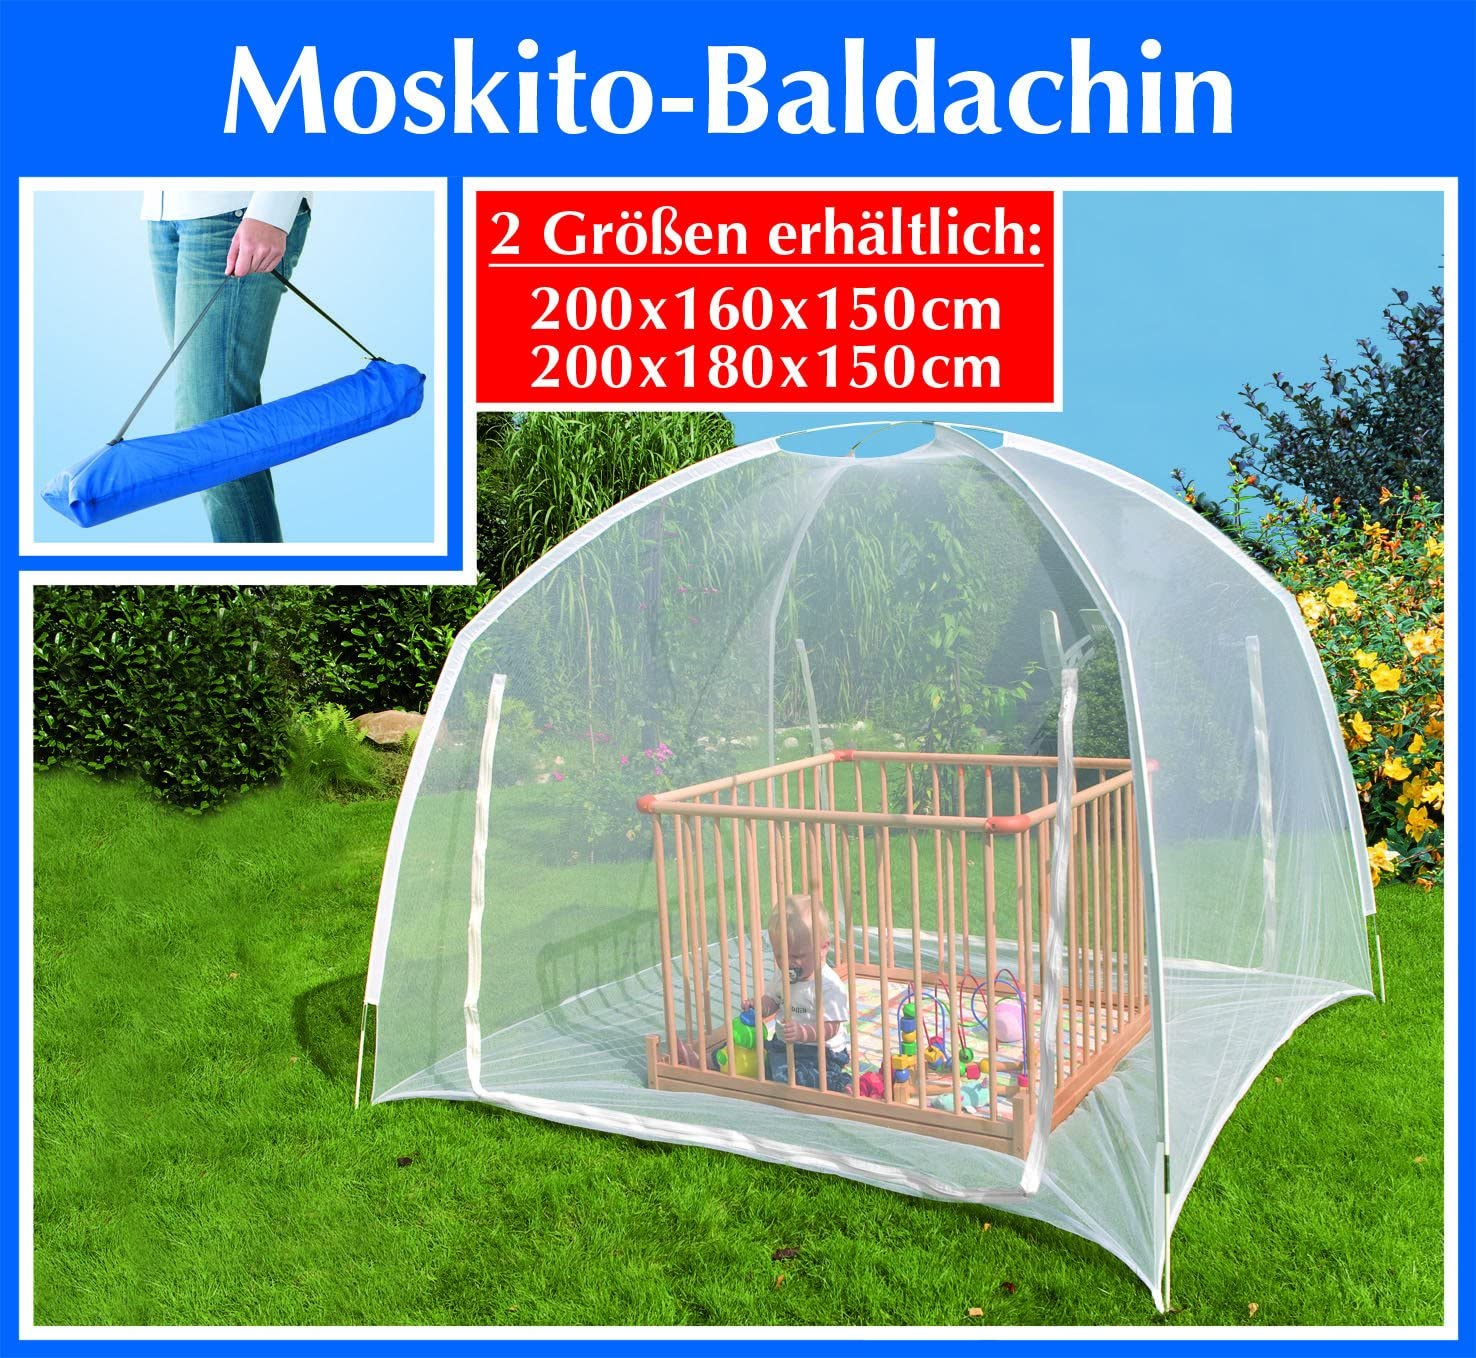 Festnight Mongolei Netz Moskitonetz Insektenschutz Insektenschutznetz M/ückennetz mit 2 /Öffnungen 200 x 150 x 145 cm Wei/ß